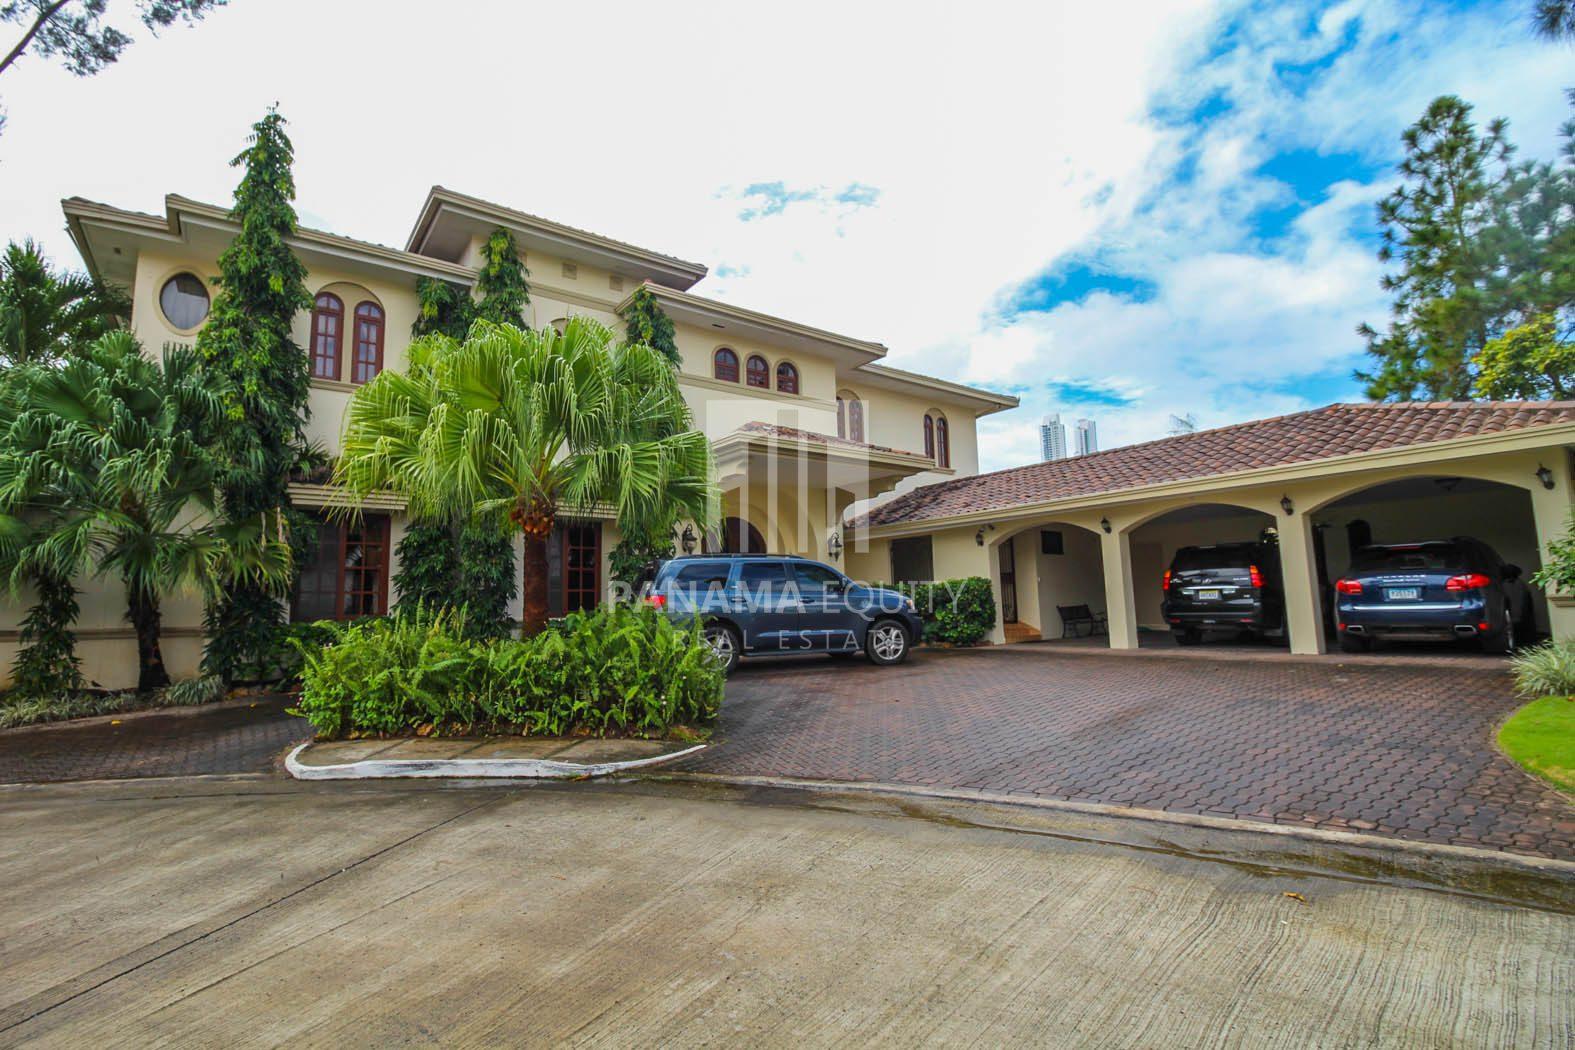 Amazing Traditional Hacienda Style Home